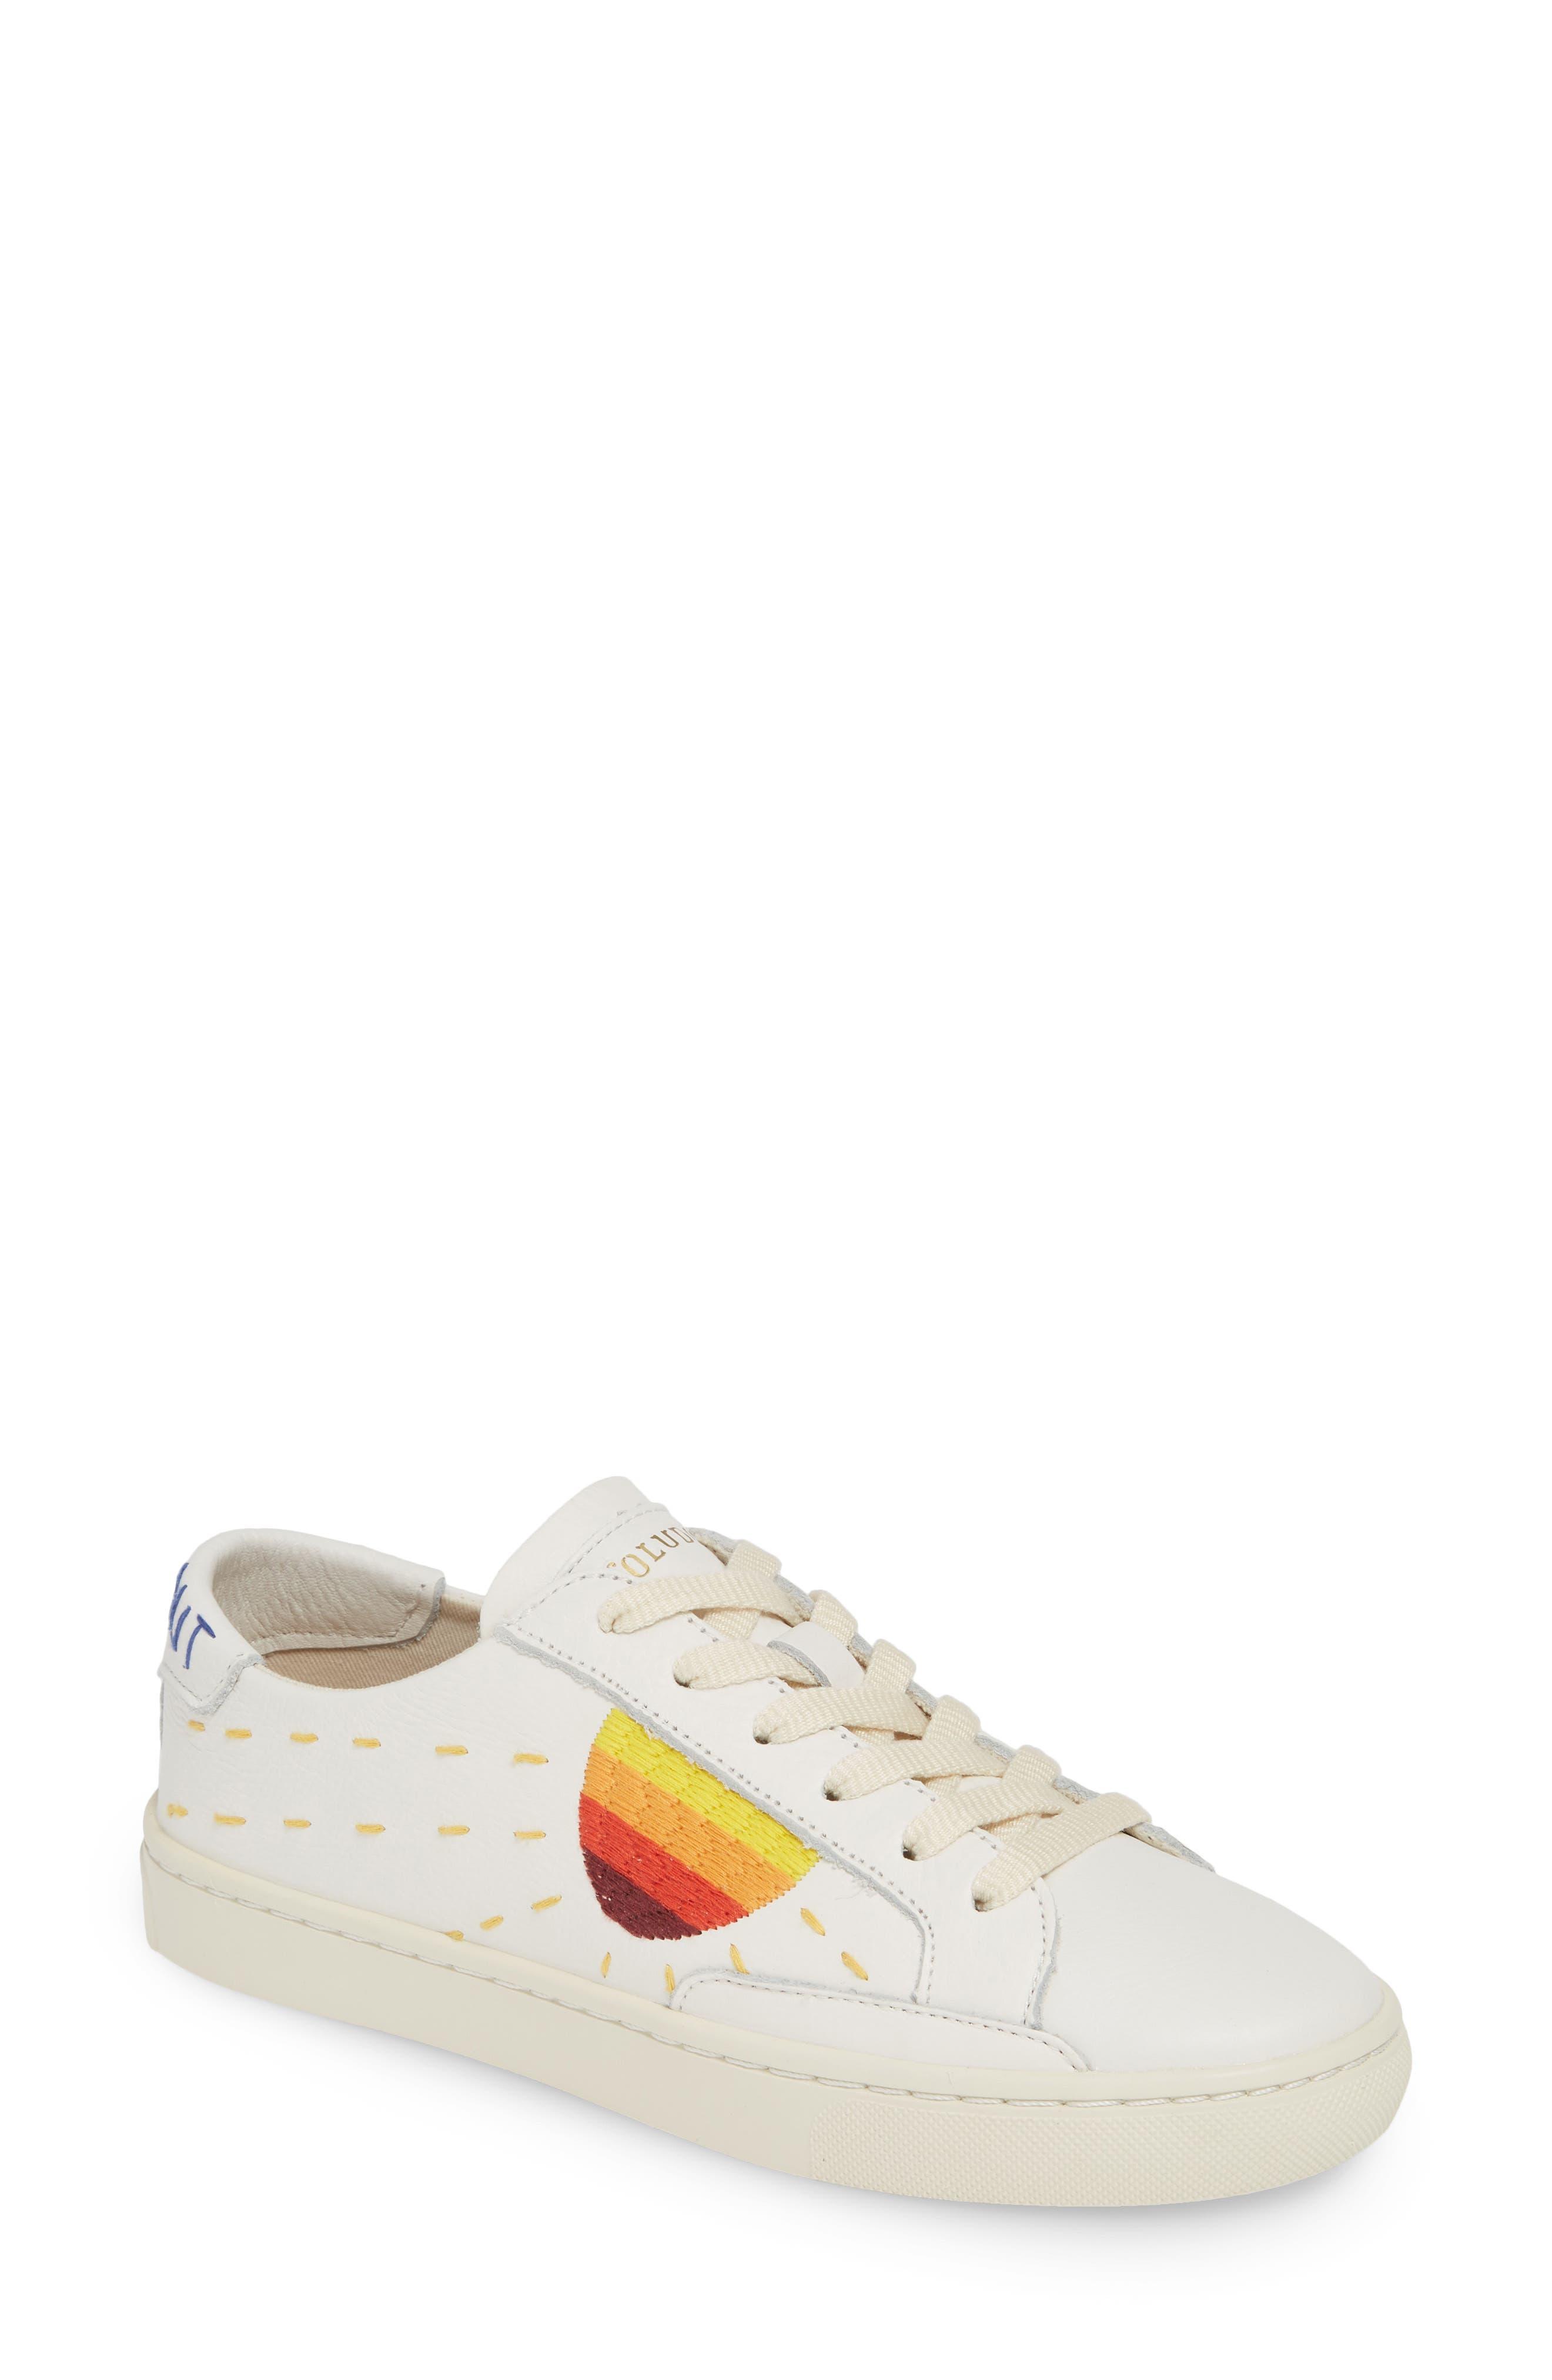 Soludos | Peace Out Sun Sneaker